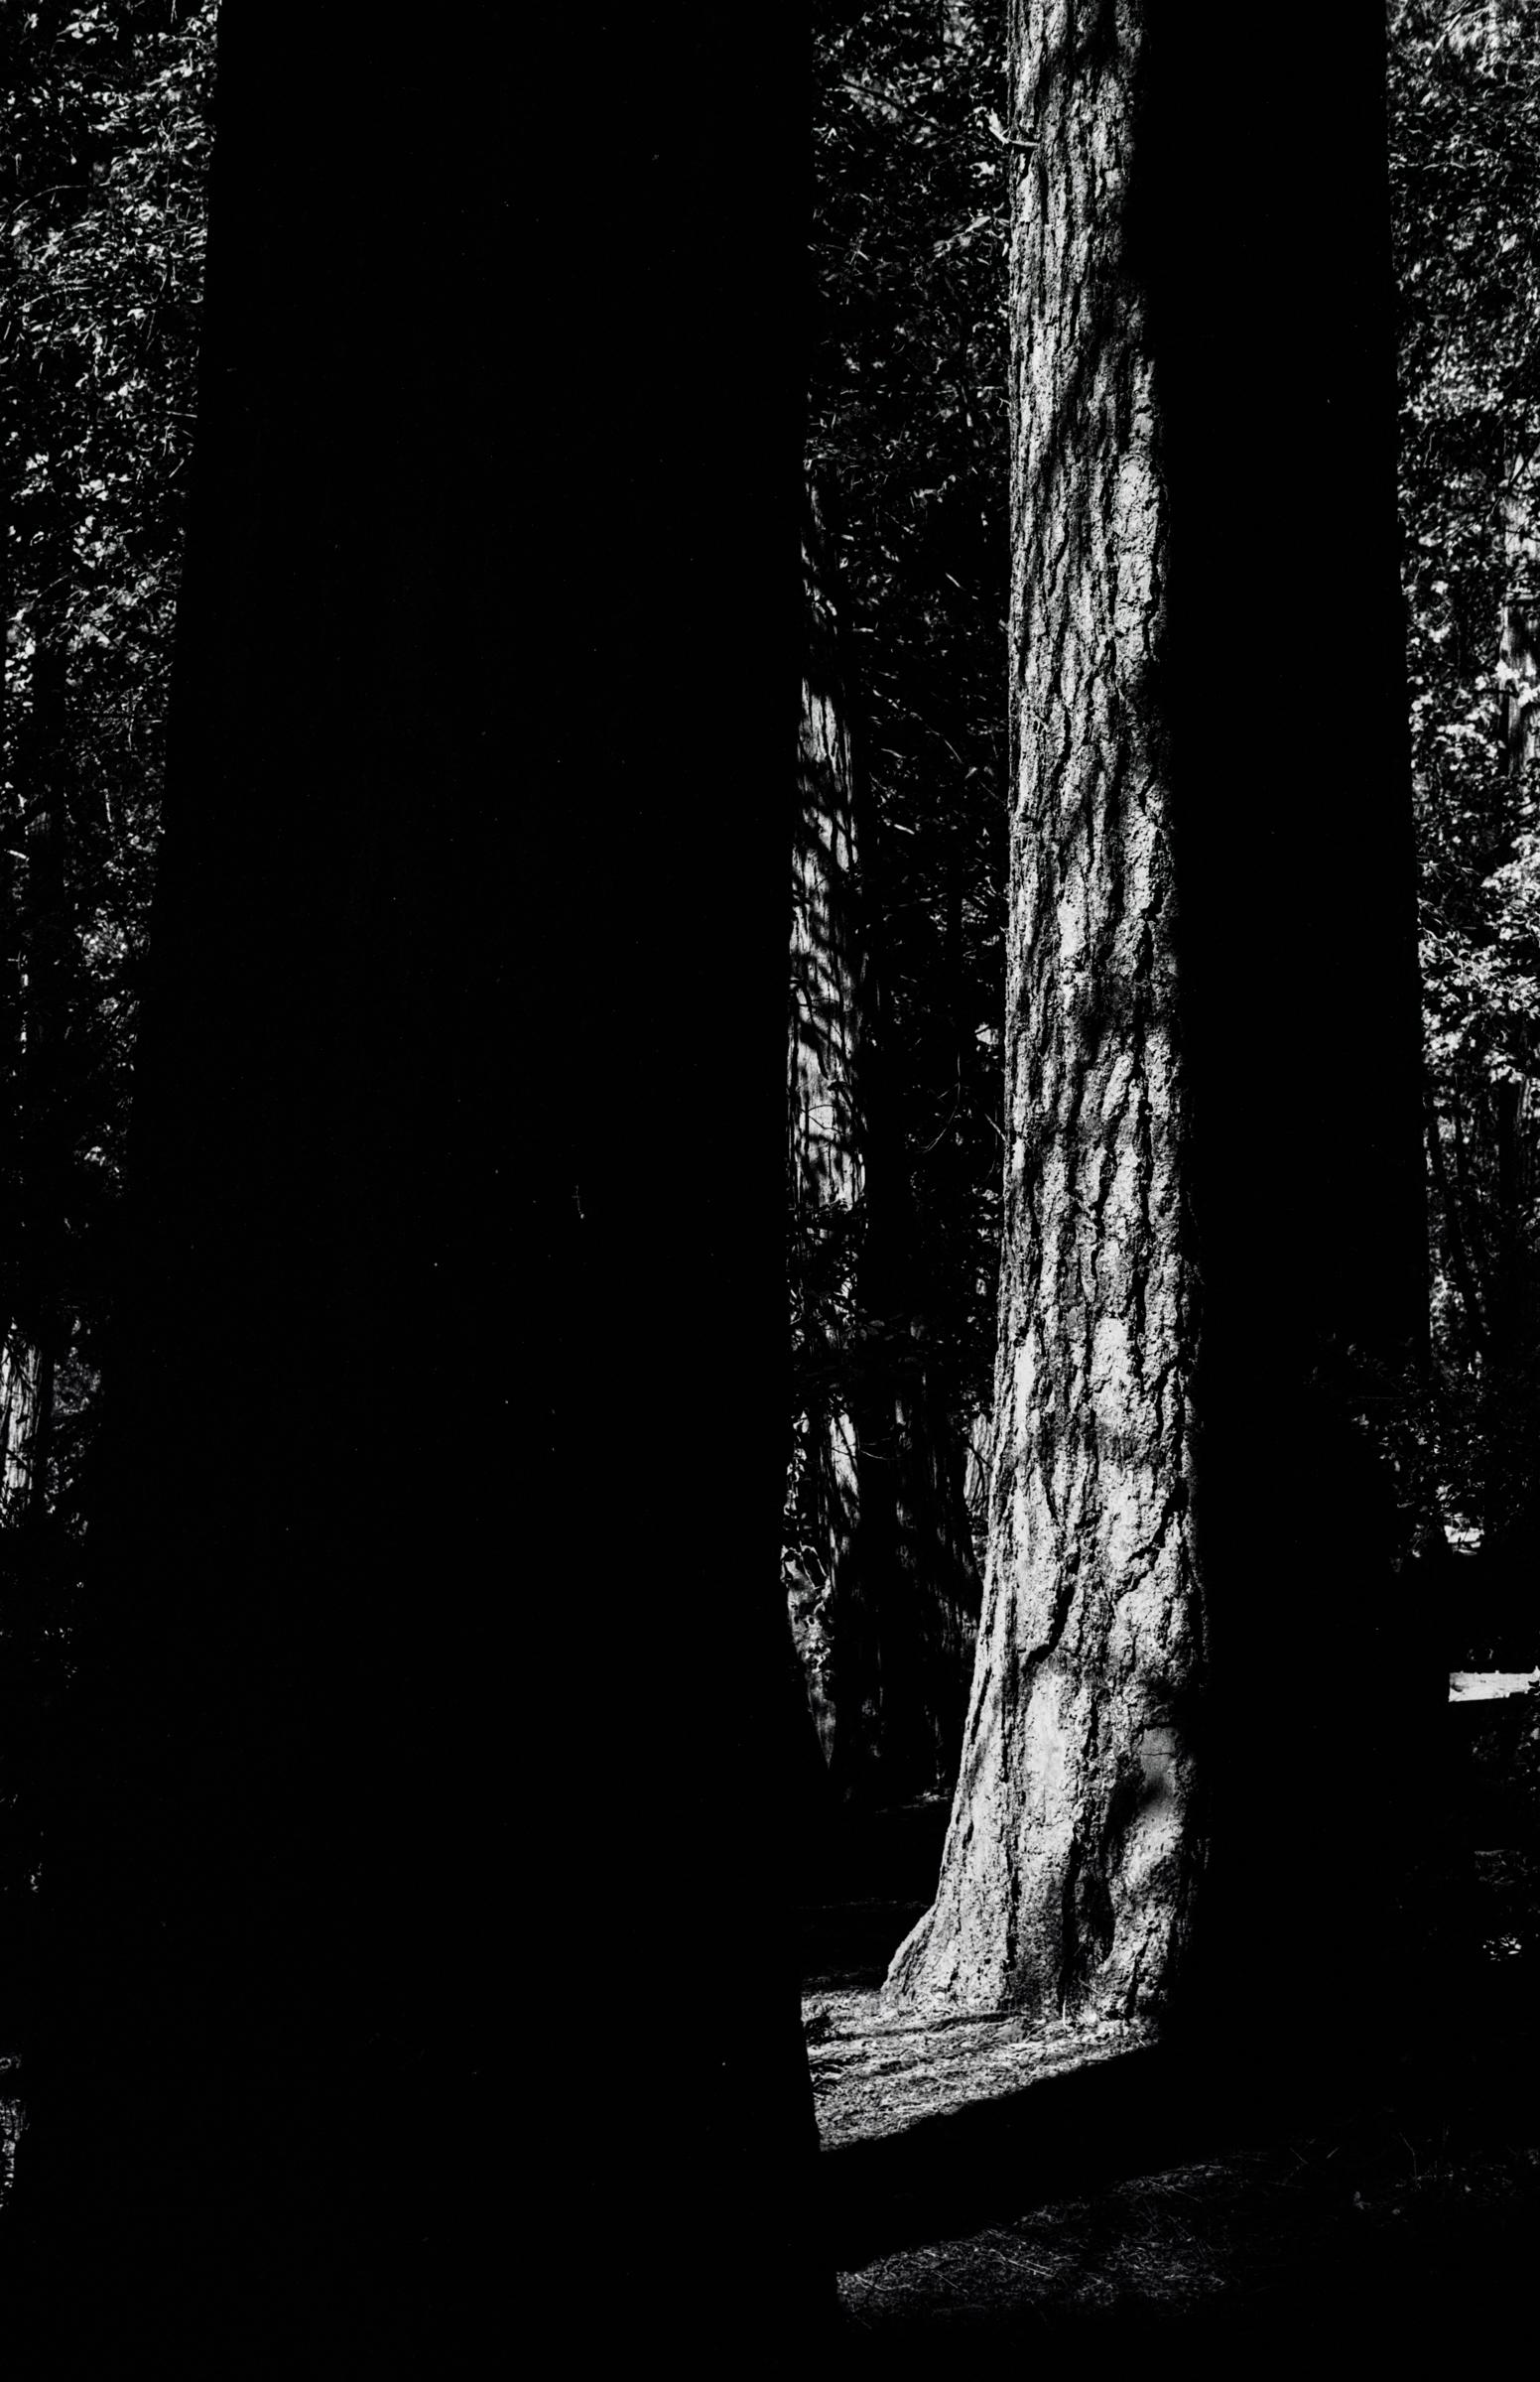 TreeInShadows1.jpg